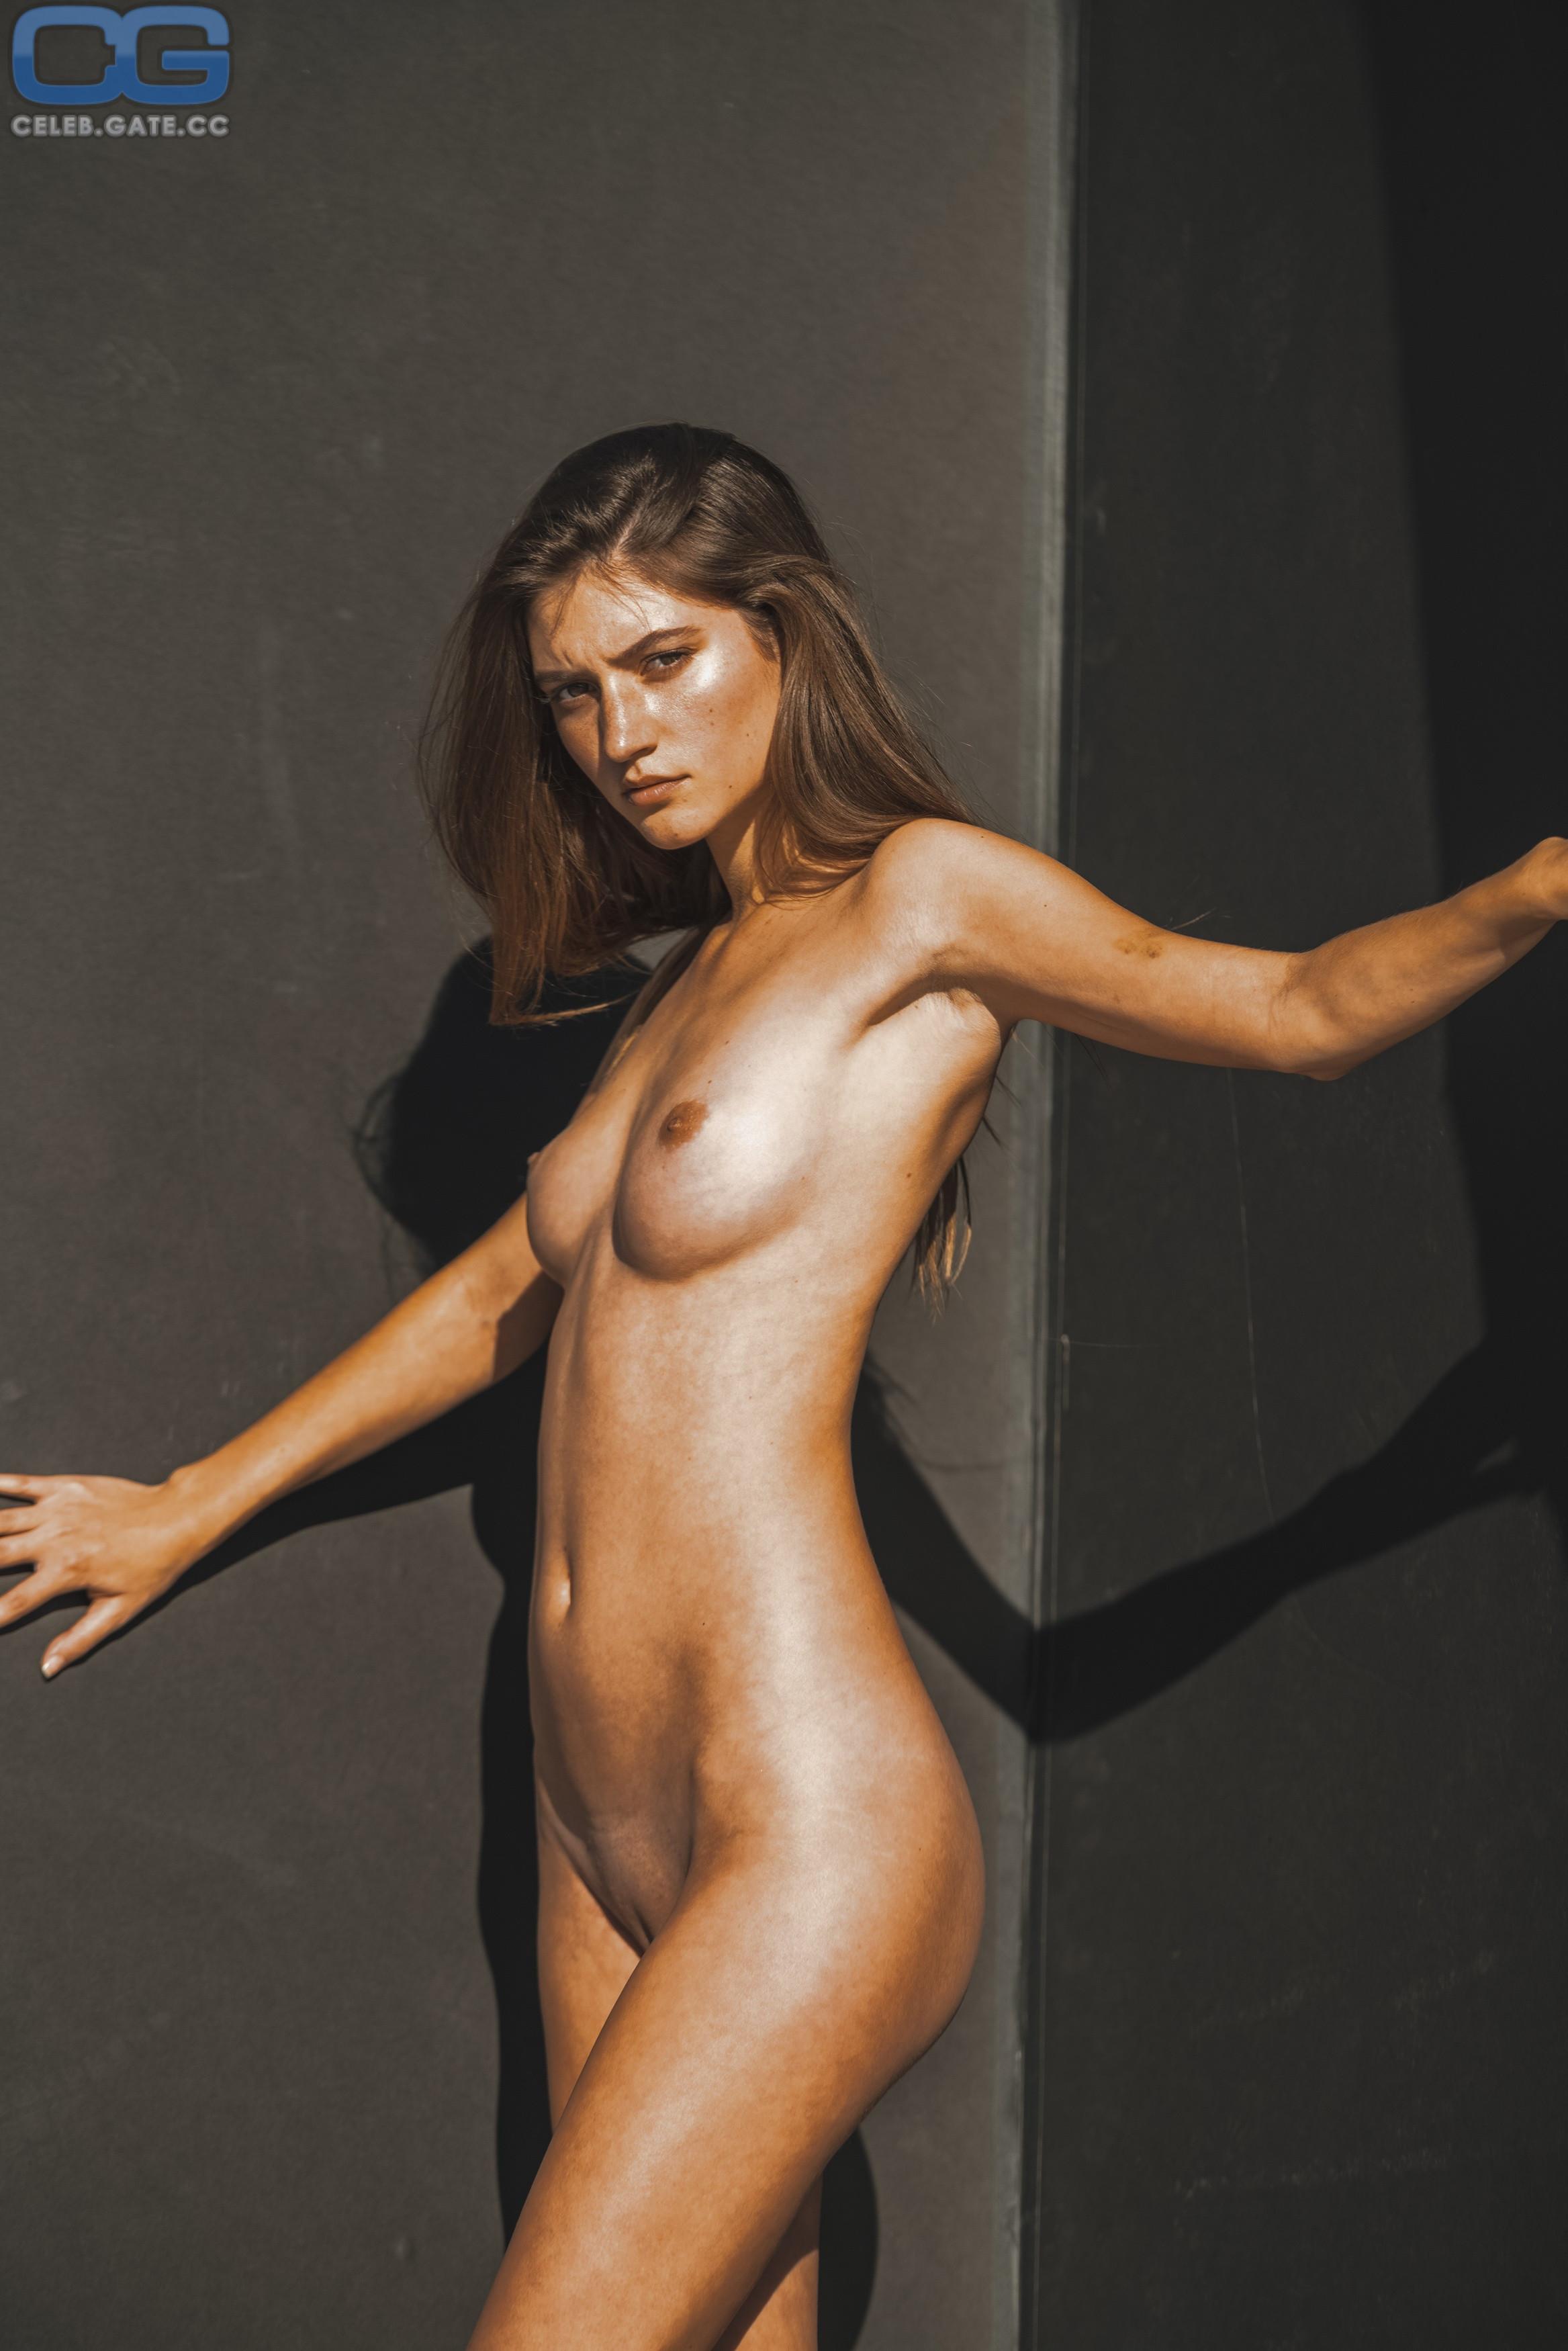 Elam nude elizabeth The centerfold